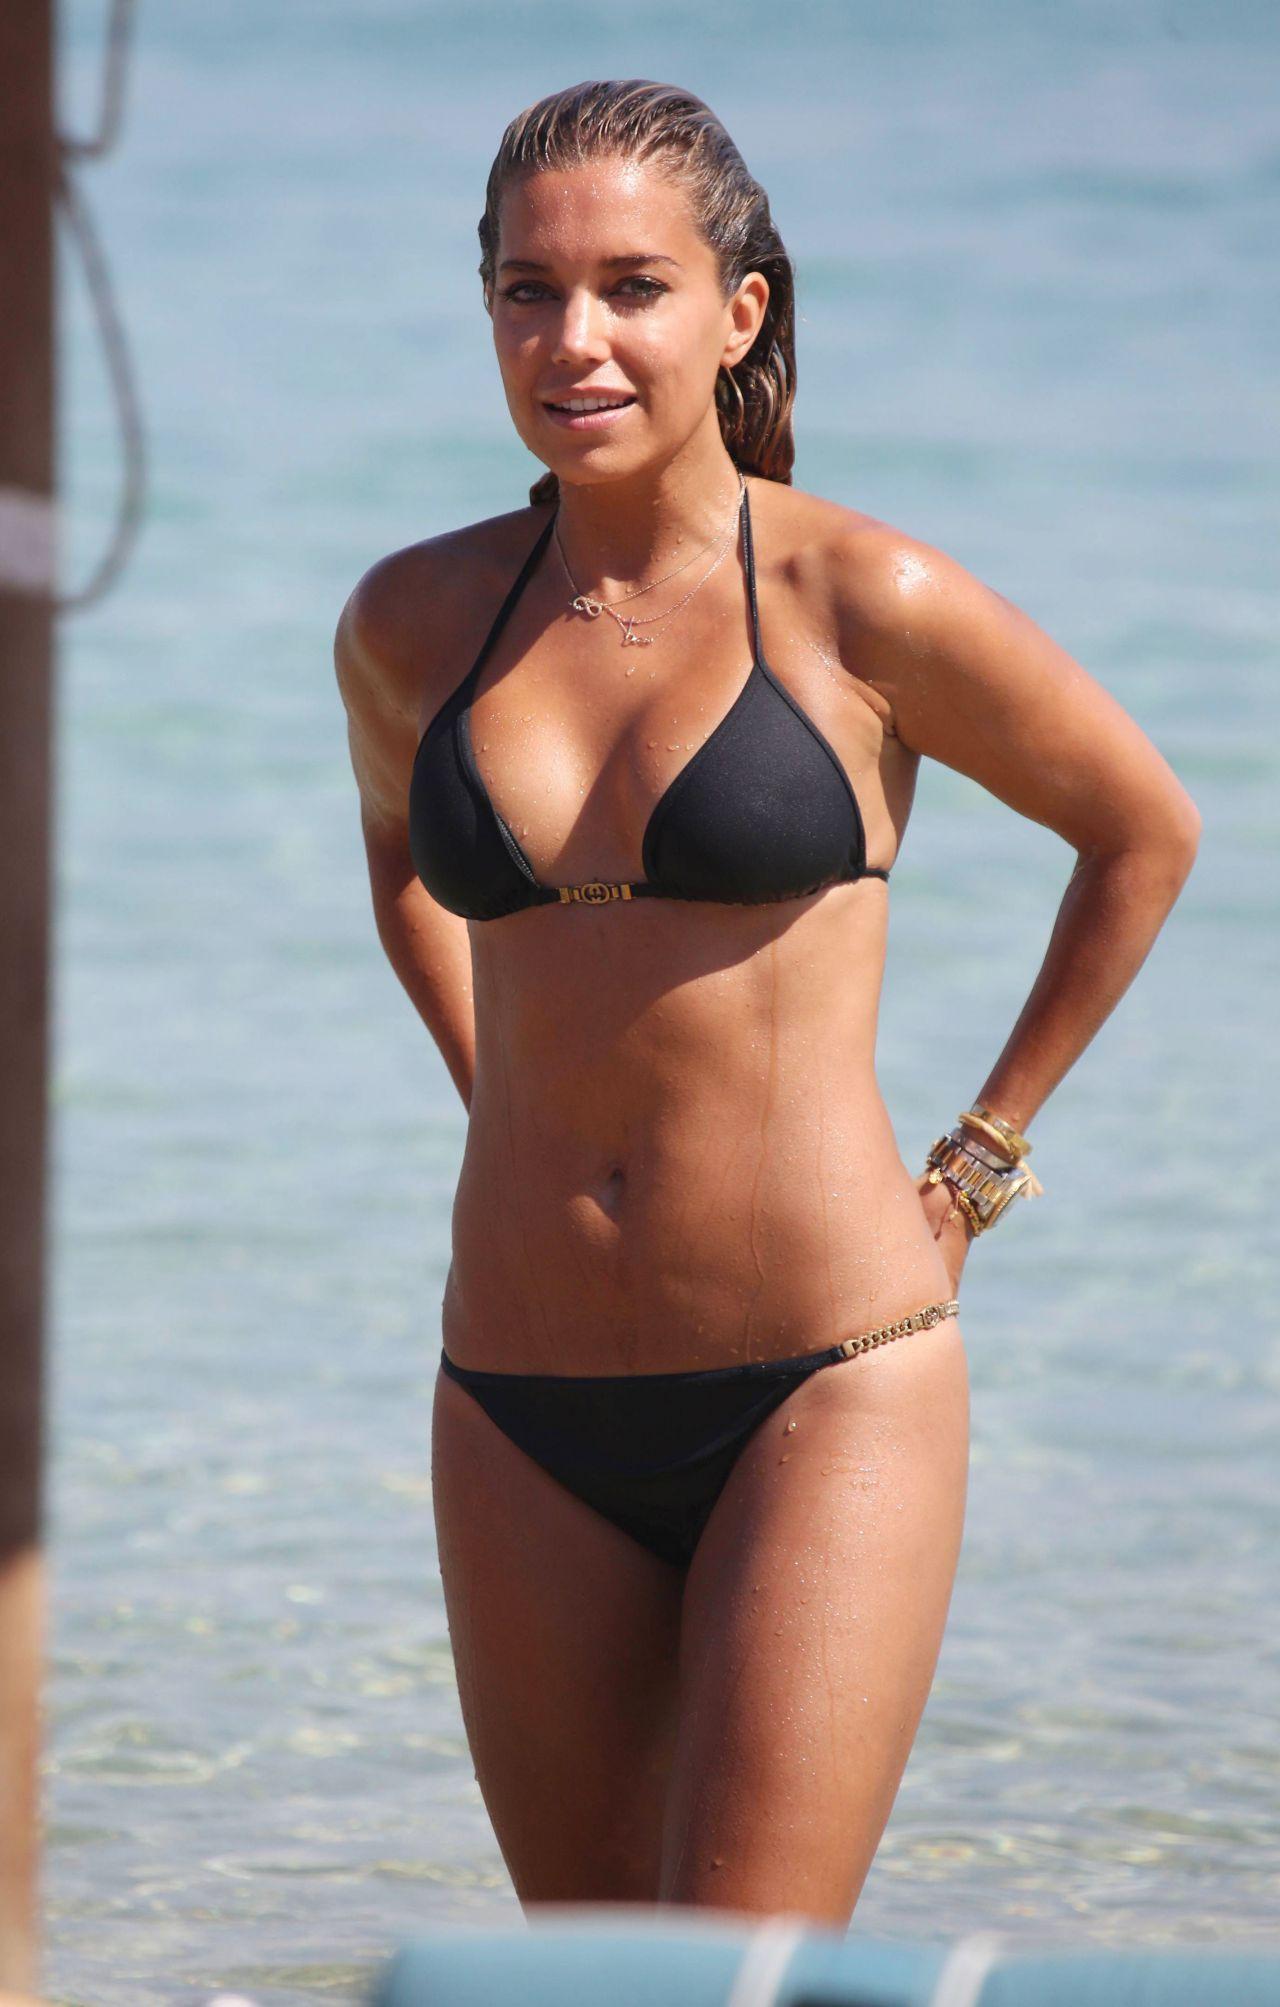 Black bikini bodies